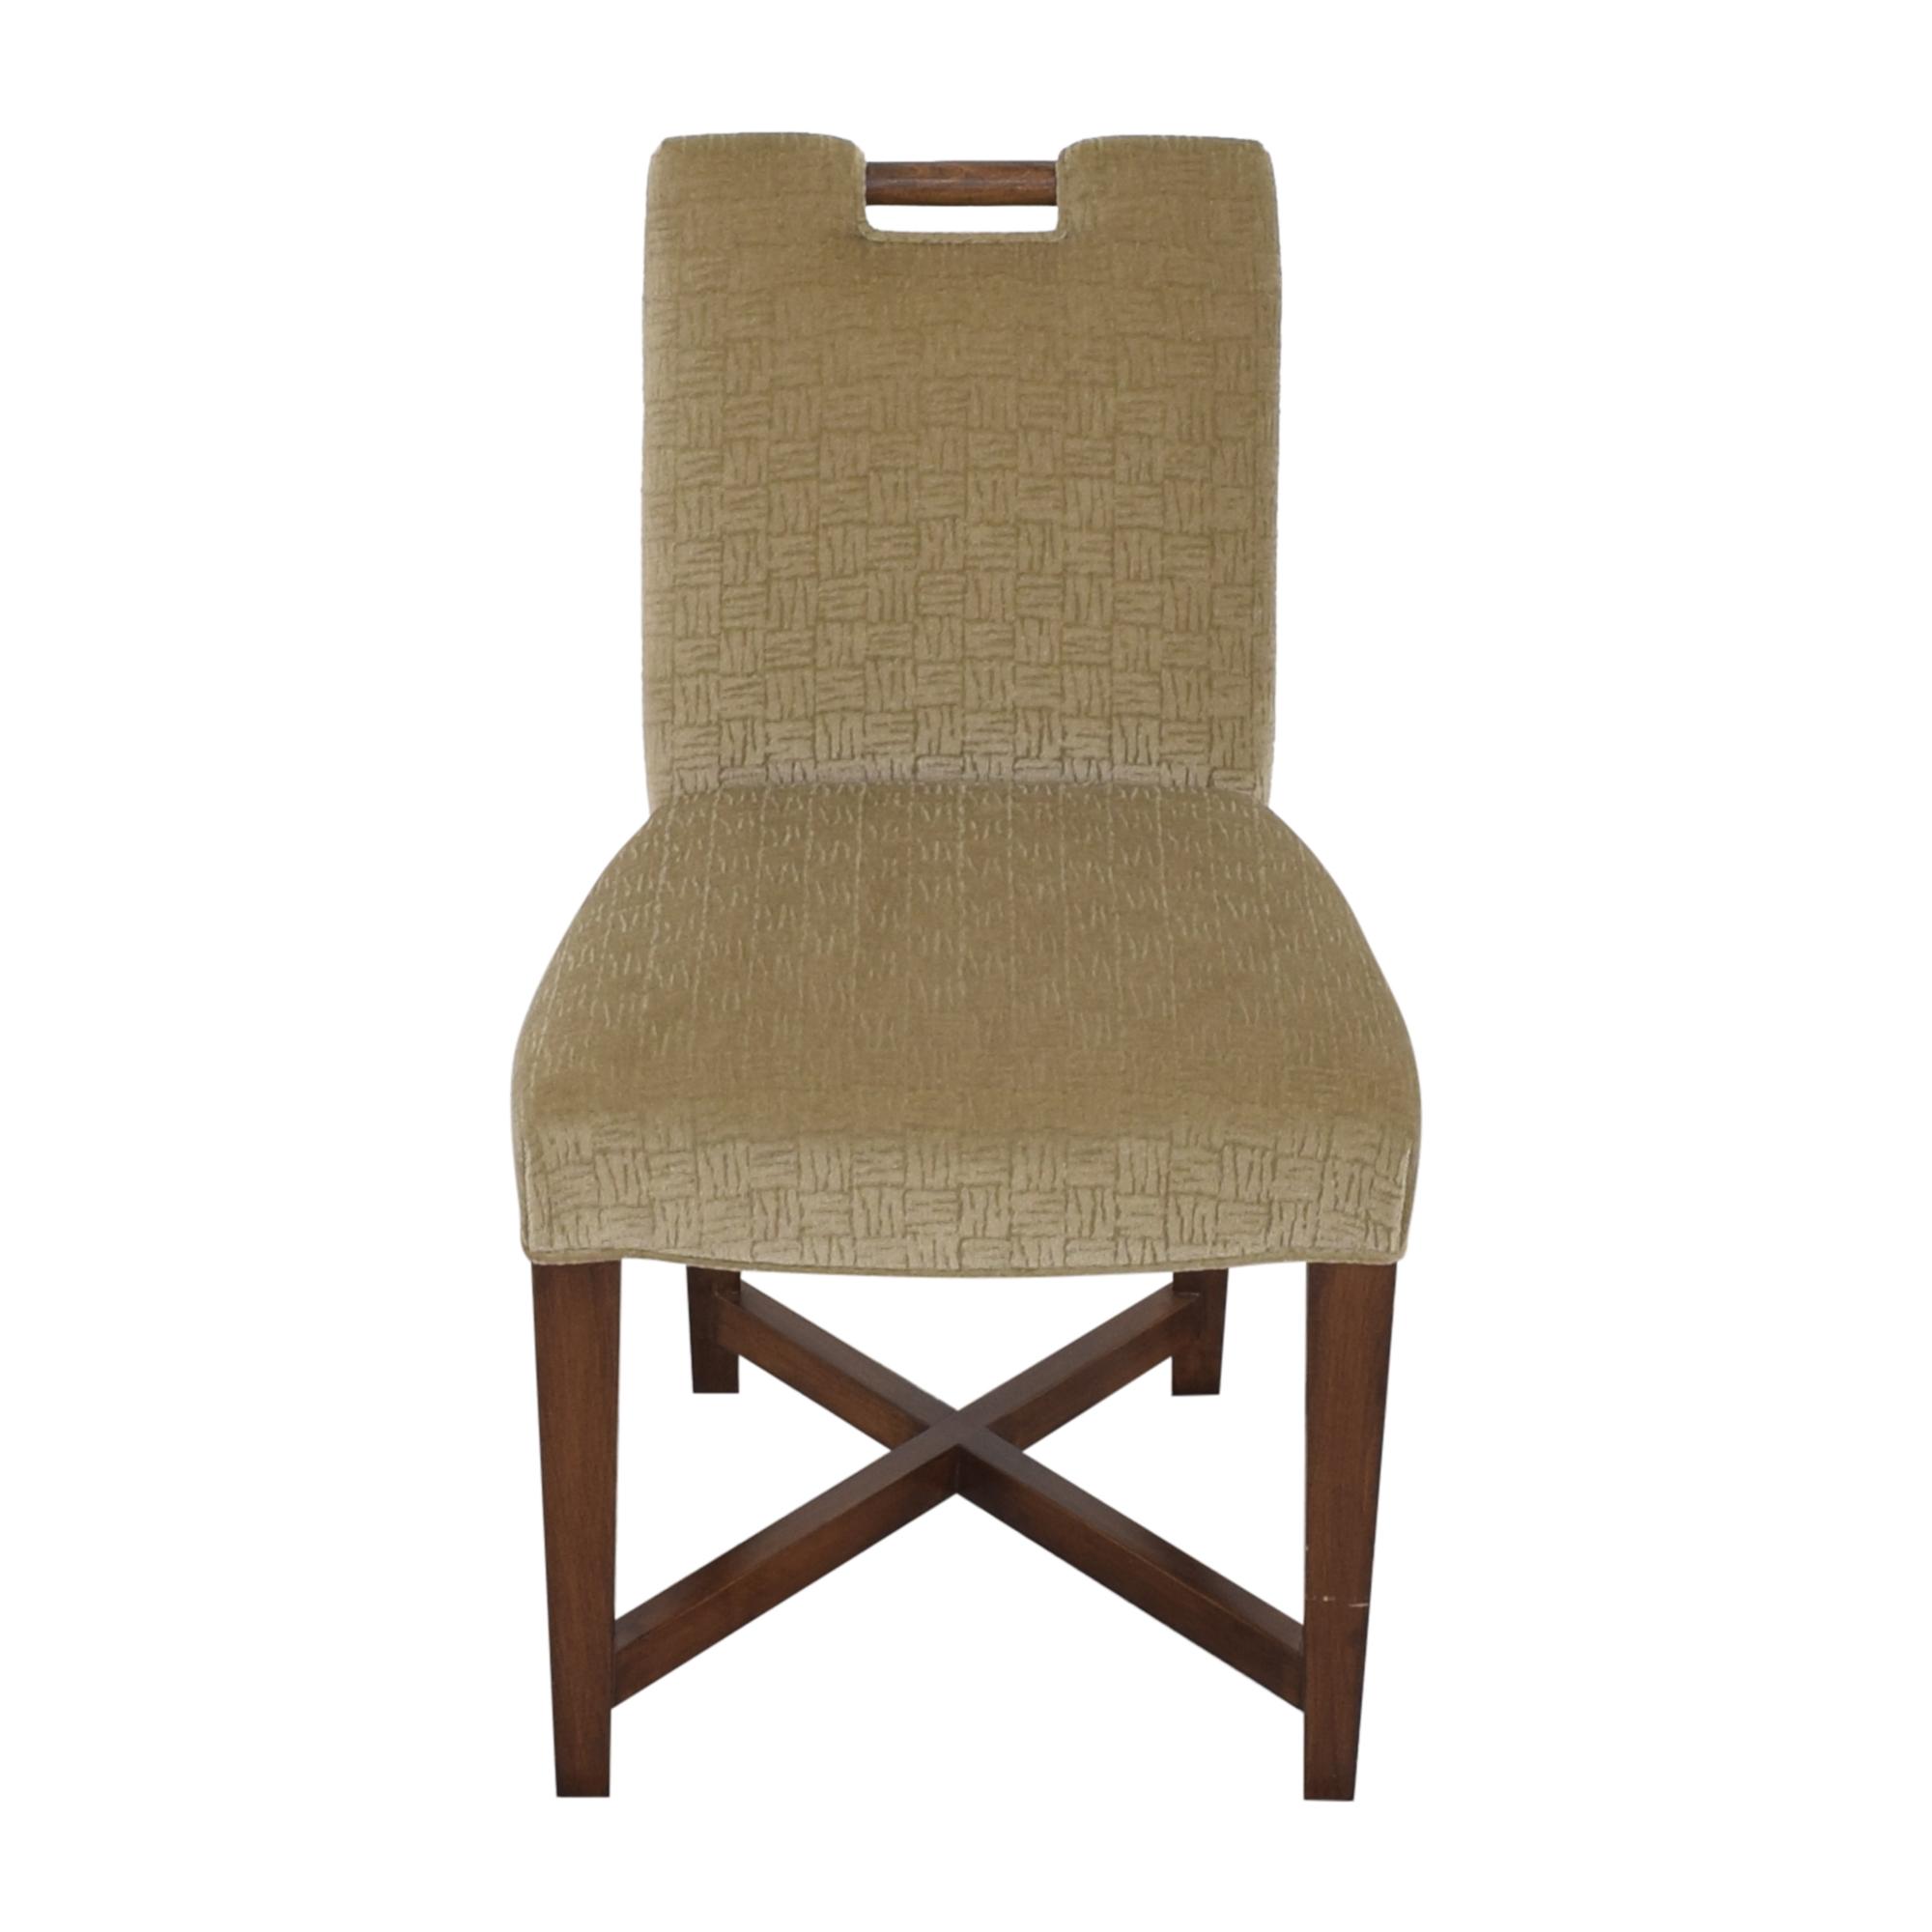 shop Donghia Custom Upholstered Chair Donghia Chairs